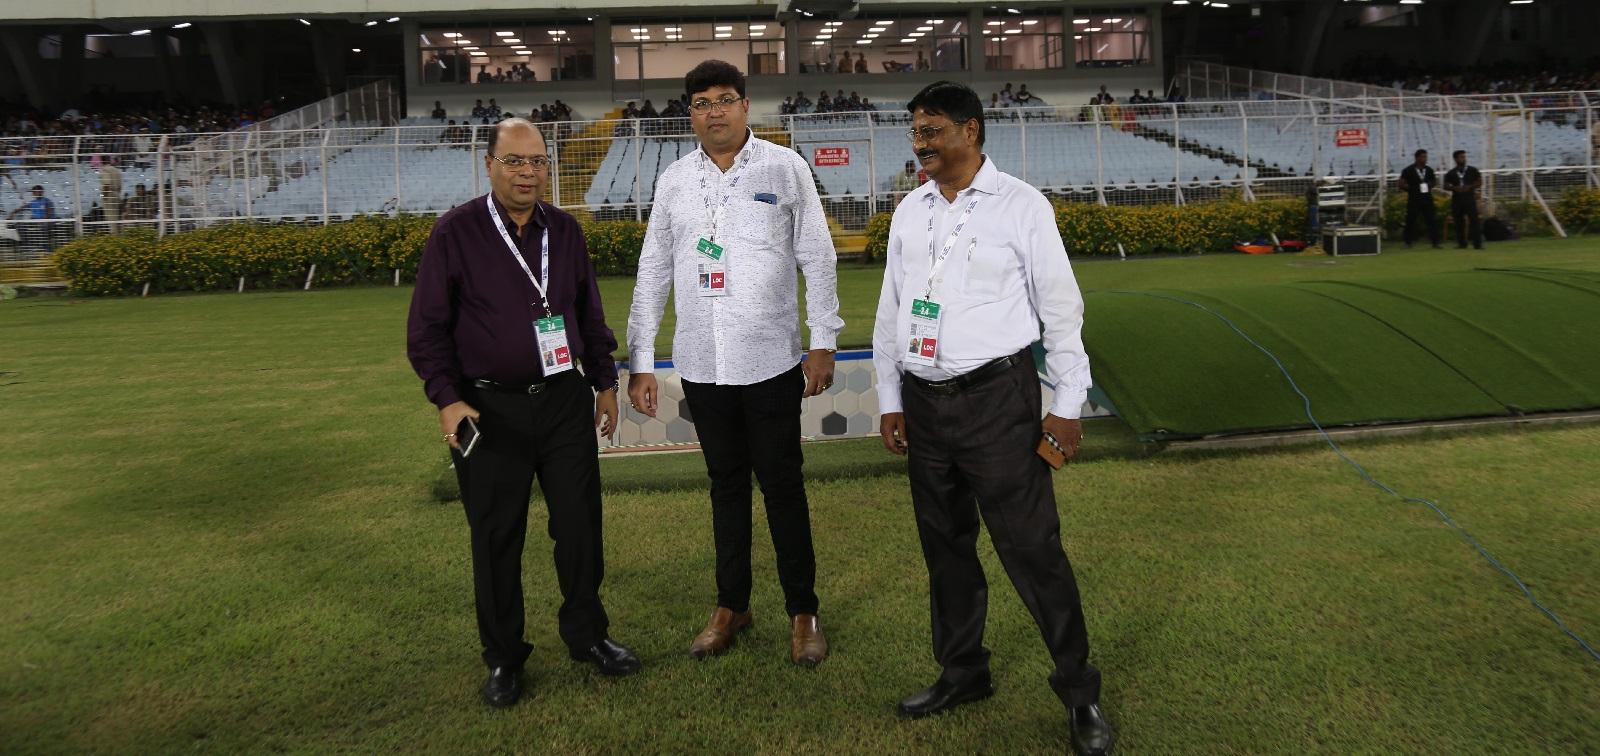 Subrata Dutta, Joydeep Mukherjee, Ajit Banerjee